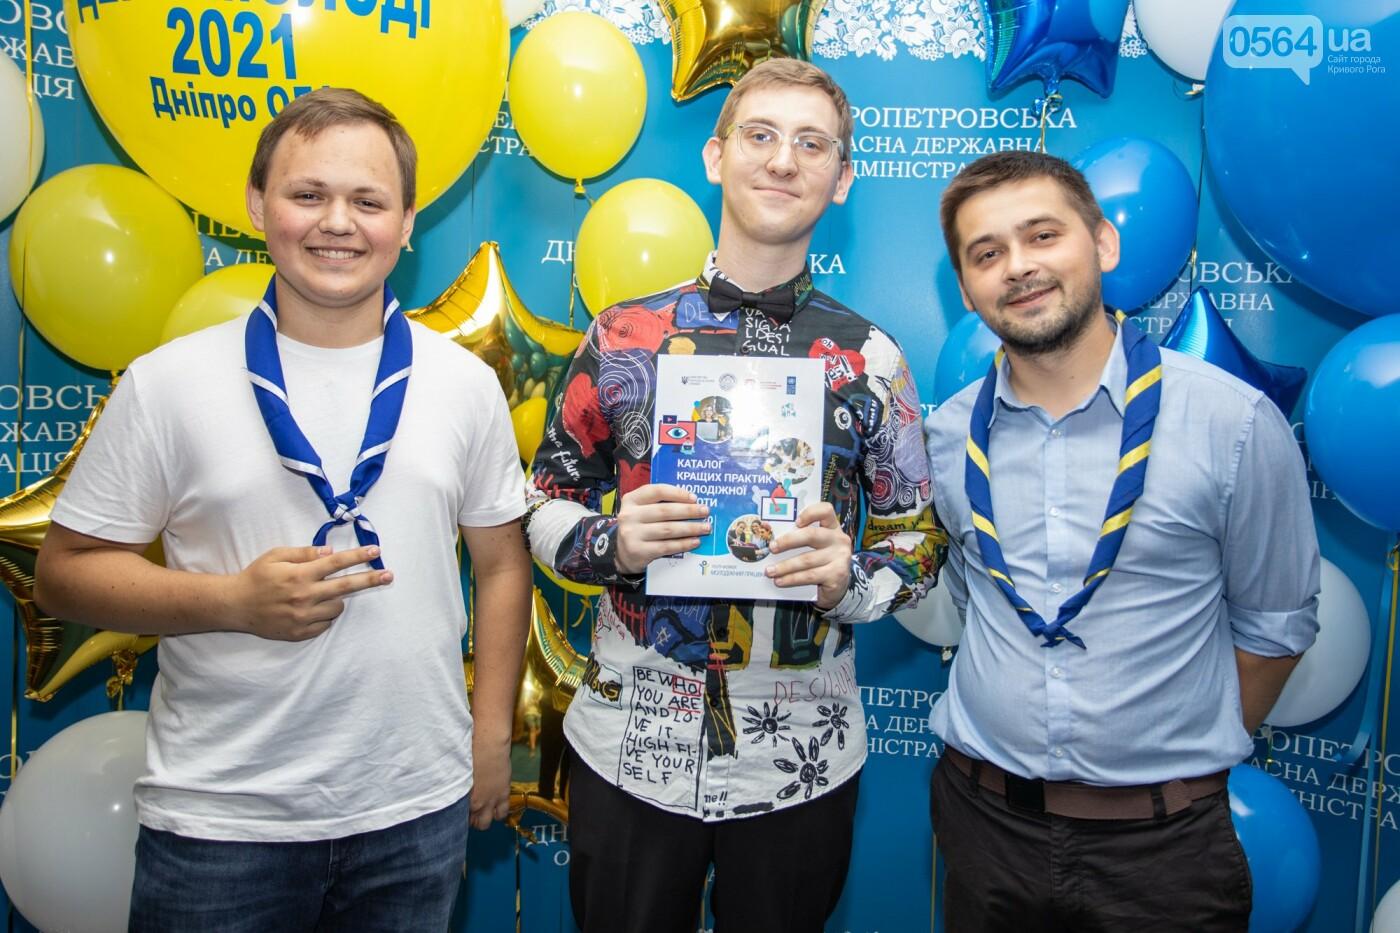 Молодым активистам Днепропетровщины вручили отличия и подарки, - ФОТО , фото-6